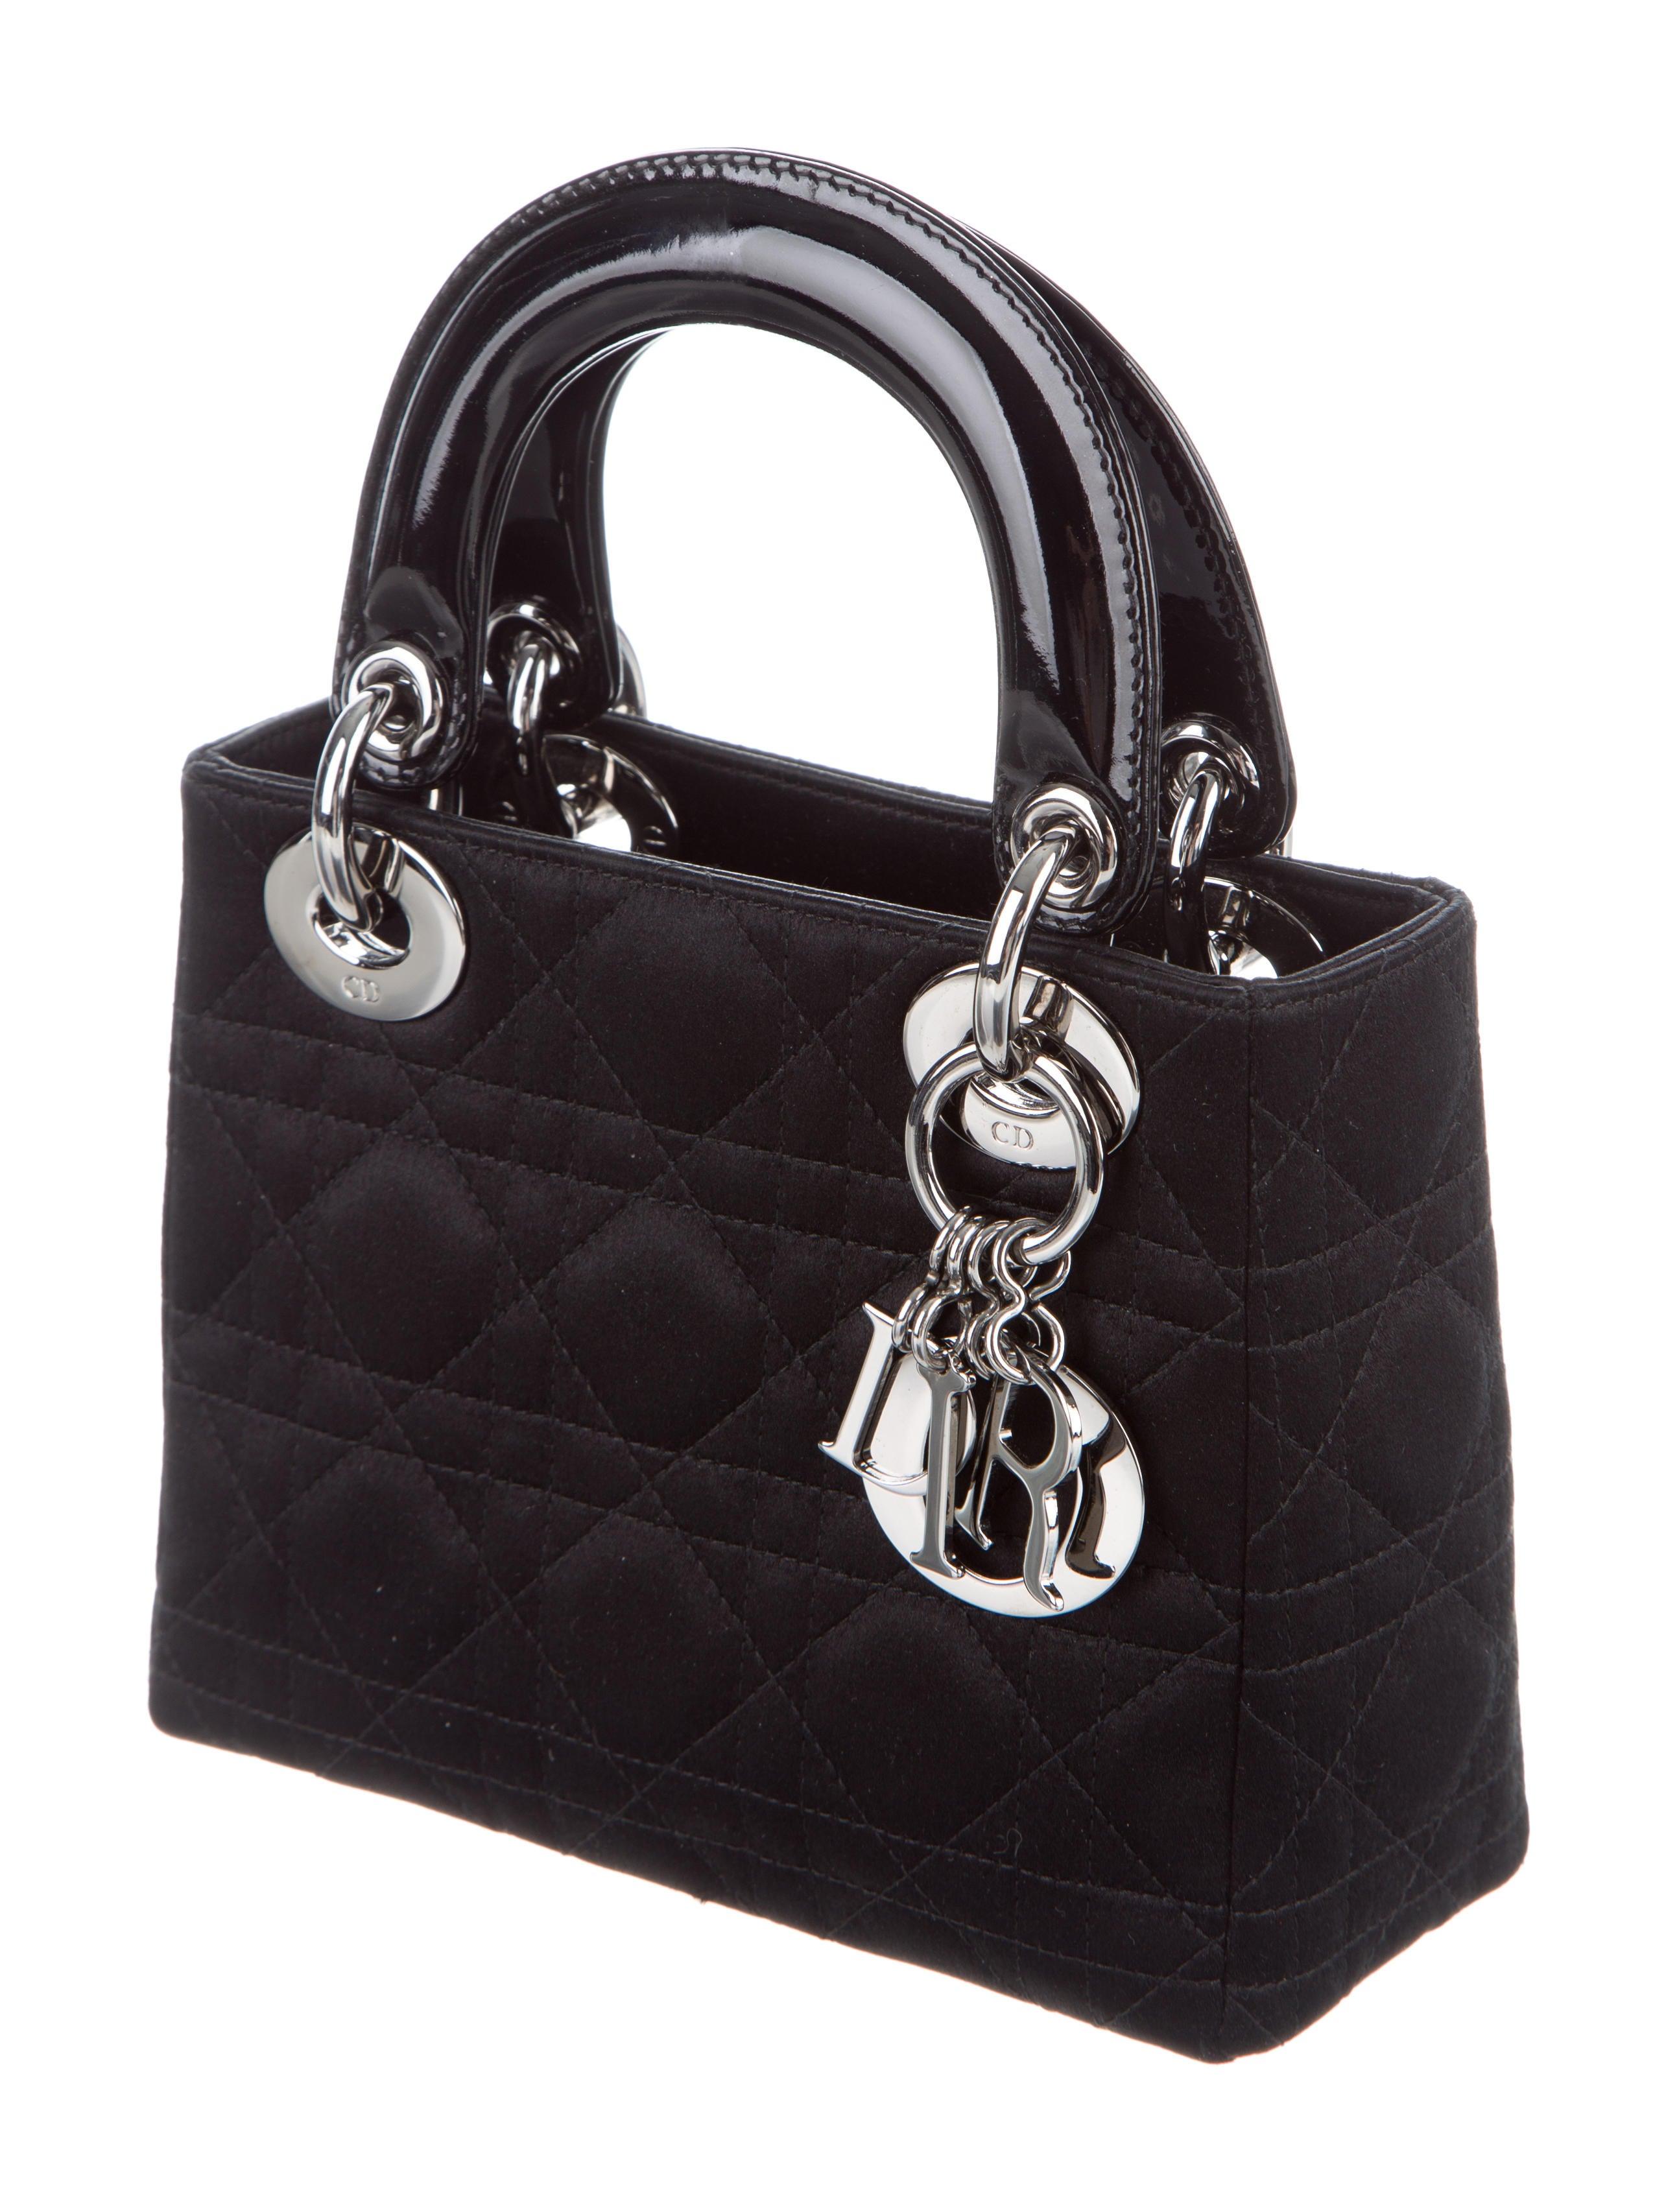 Christian Dior Micro Cannage Lady Dior Bag Handbags